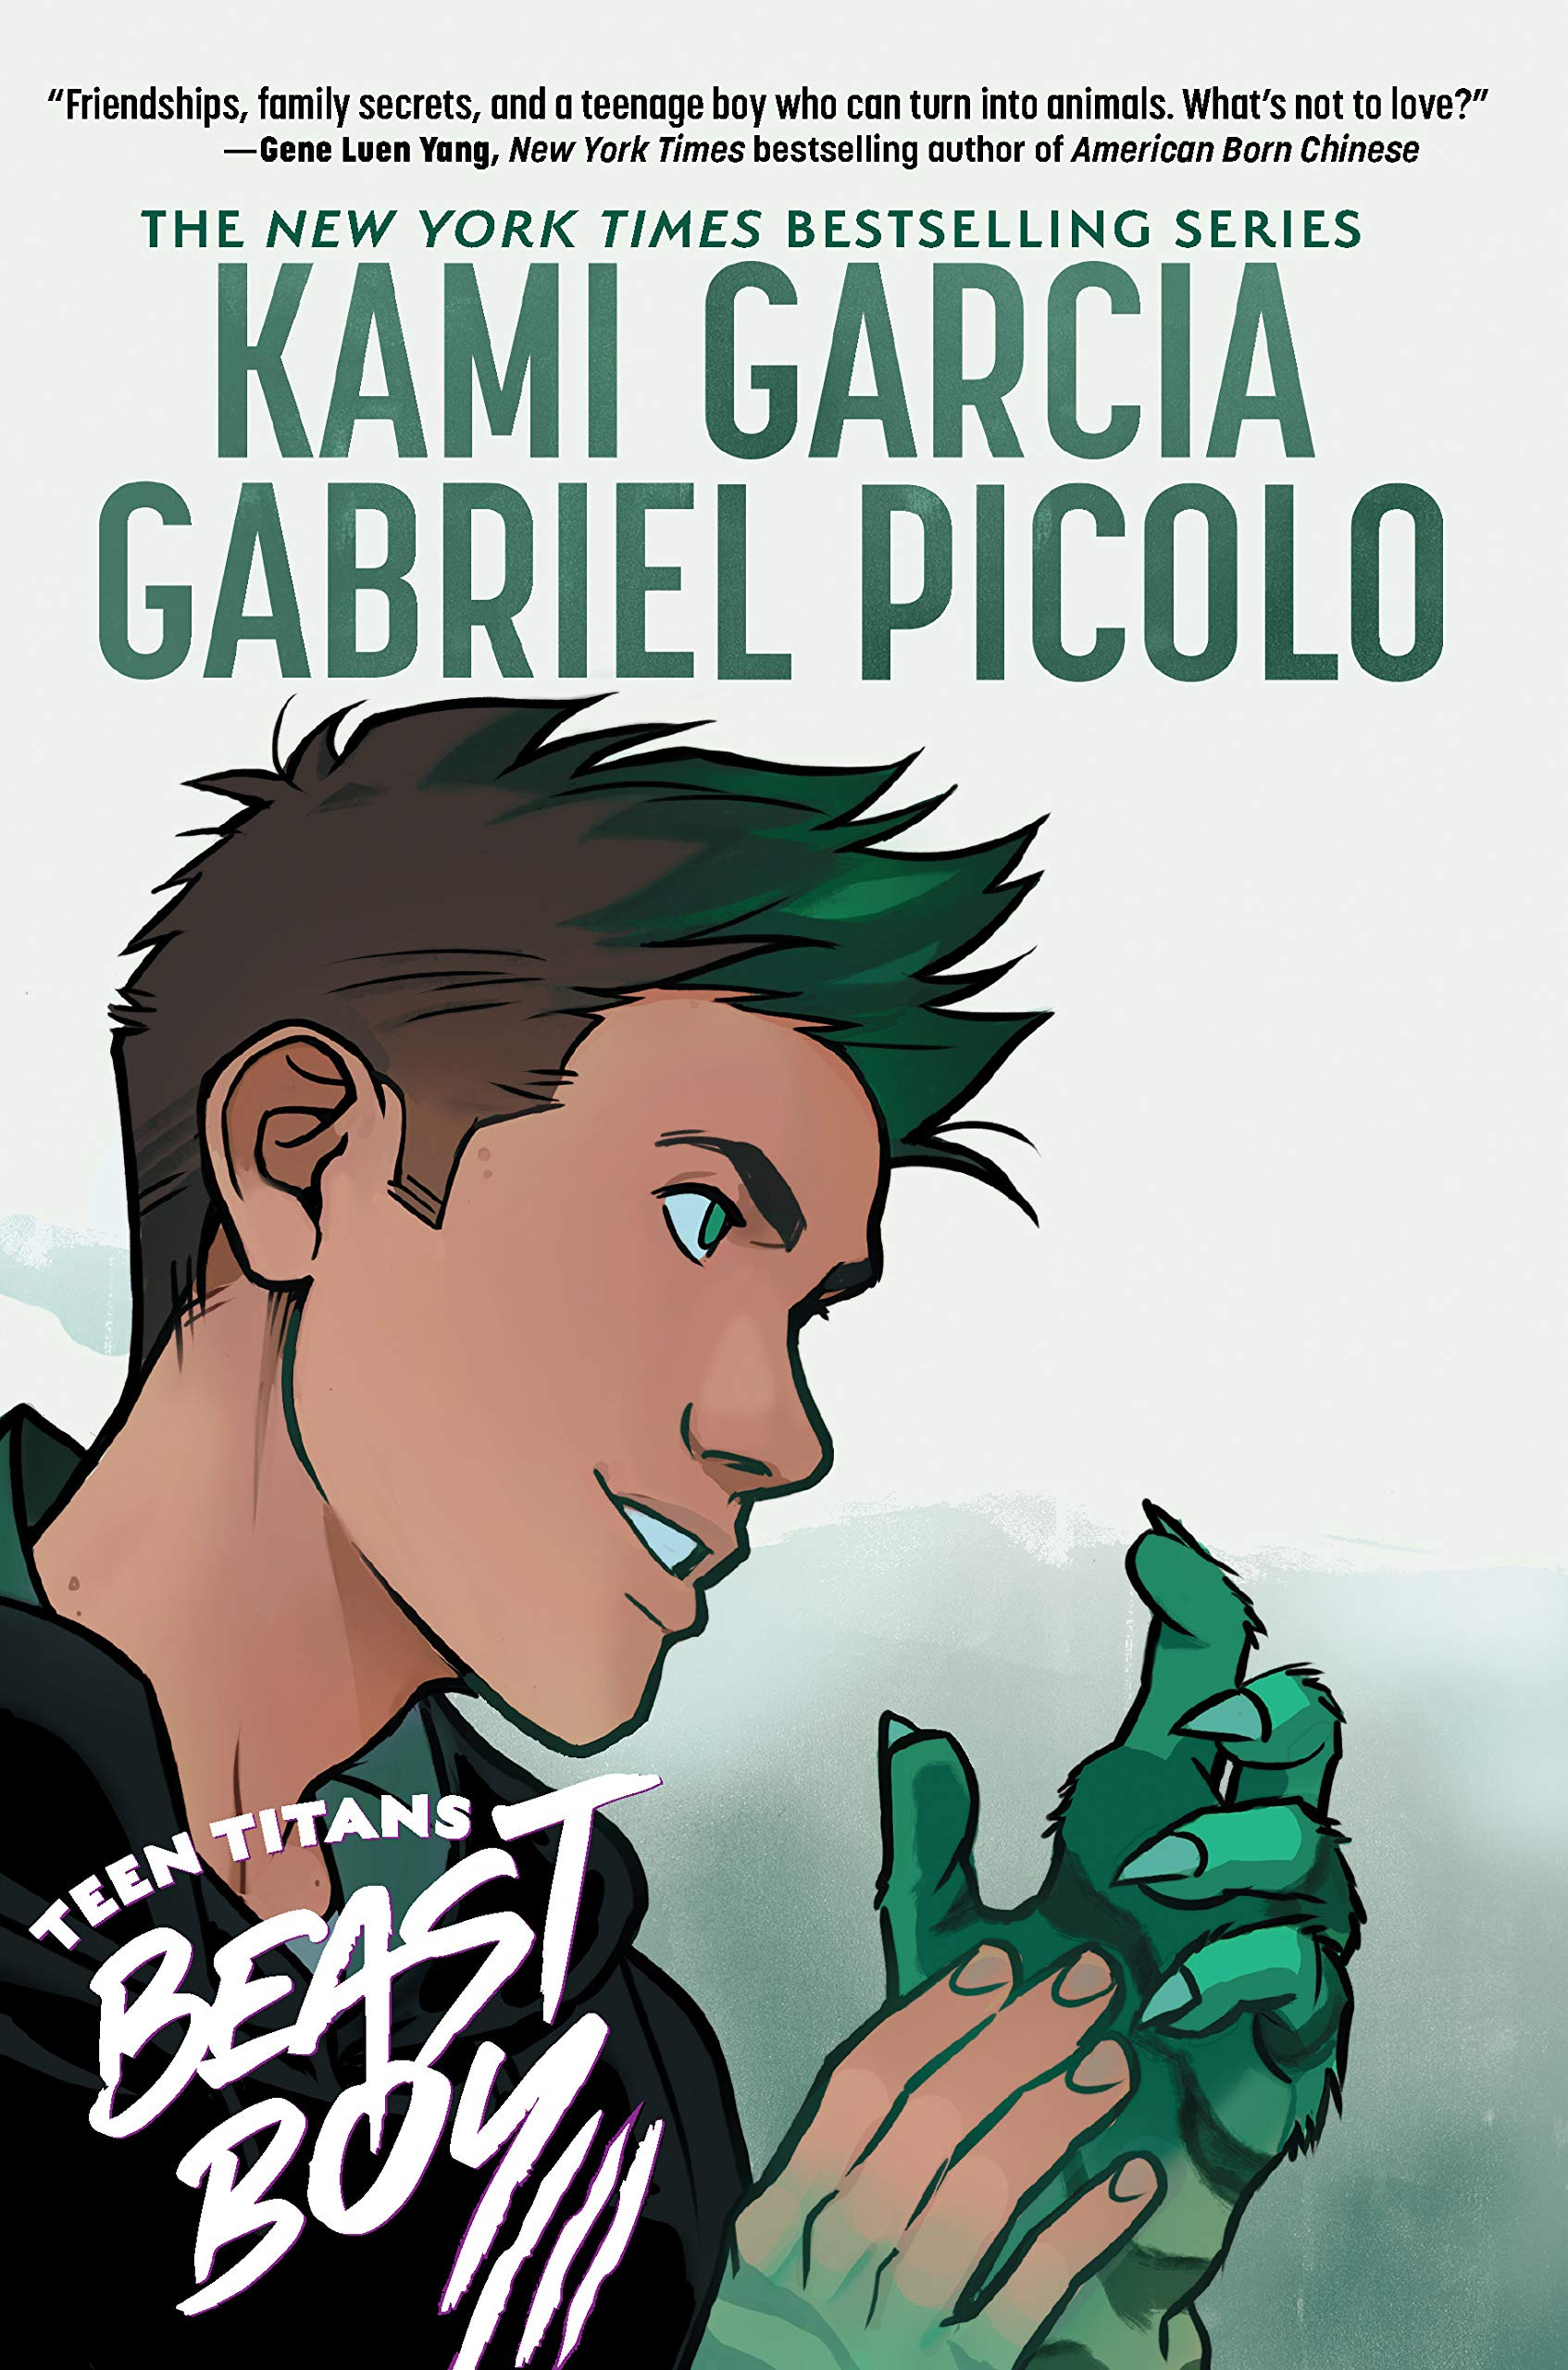 Amazon.com: Teen Titans: Beast Boy (9781401287191): Garcia, Kami, Picolo,  Gabriel: Books